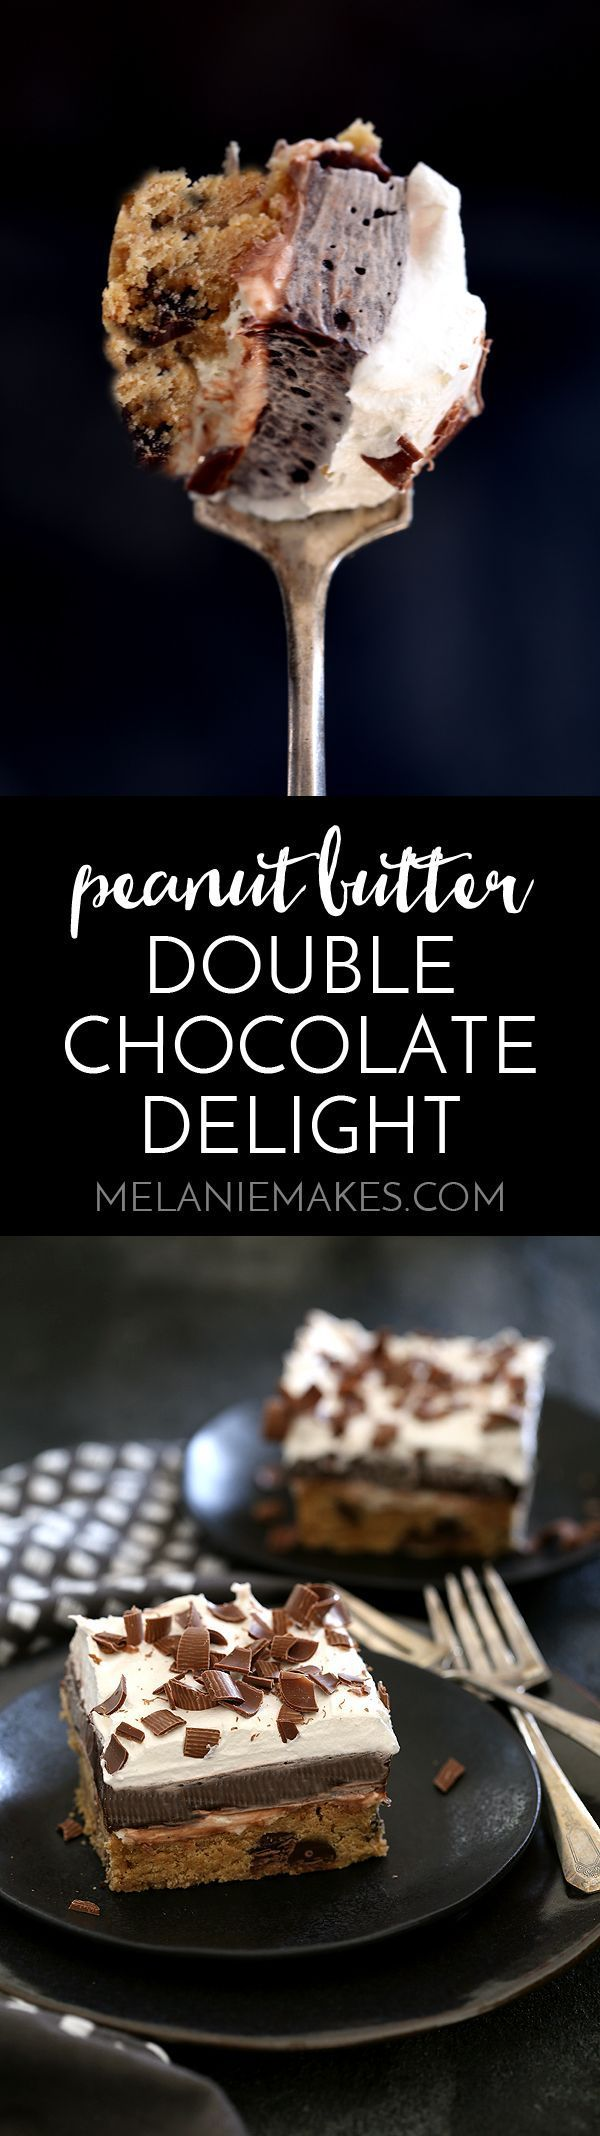 25+ best ideas about Peanut butter chocolate pie on Pinterest ...